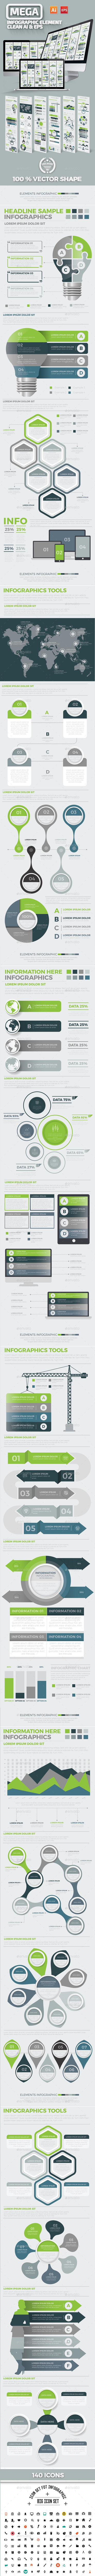 Mega Infographics Elements Design - Infographics